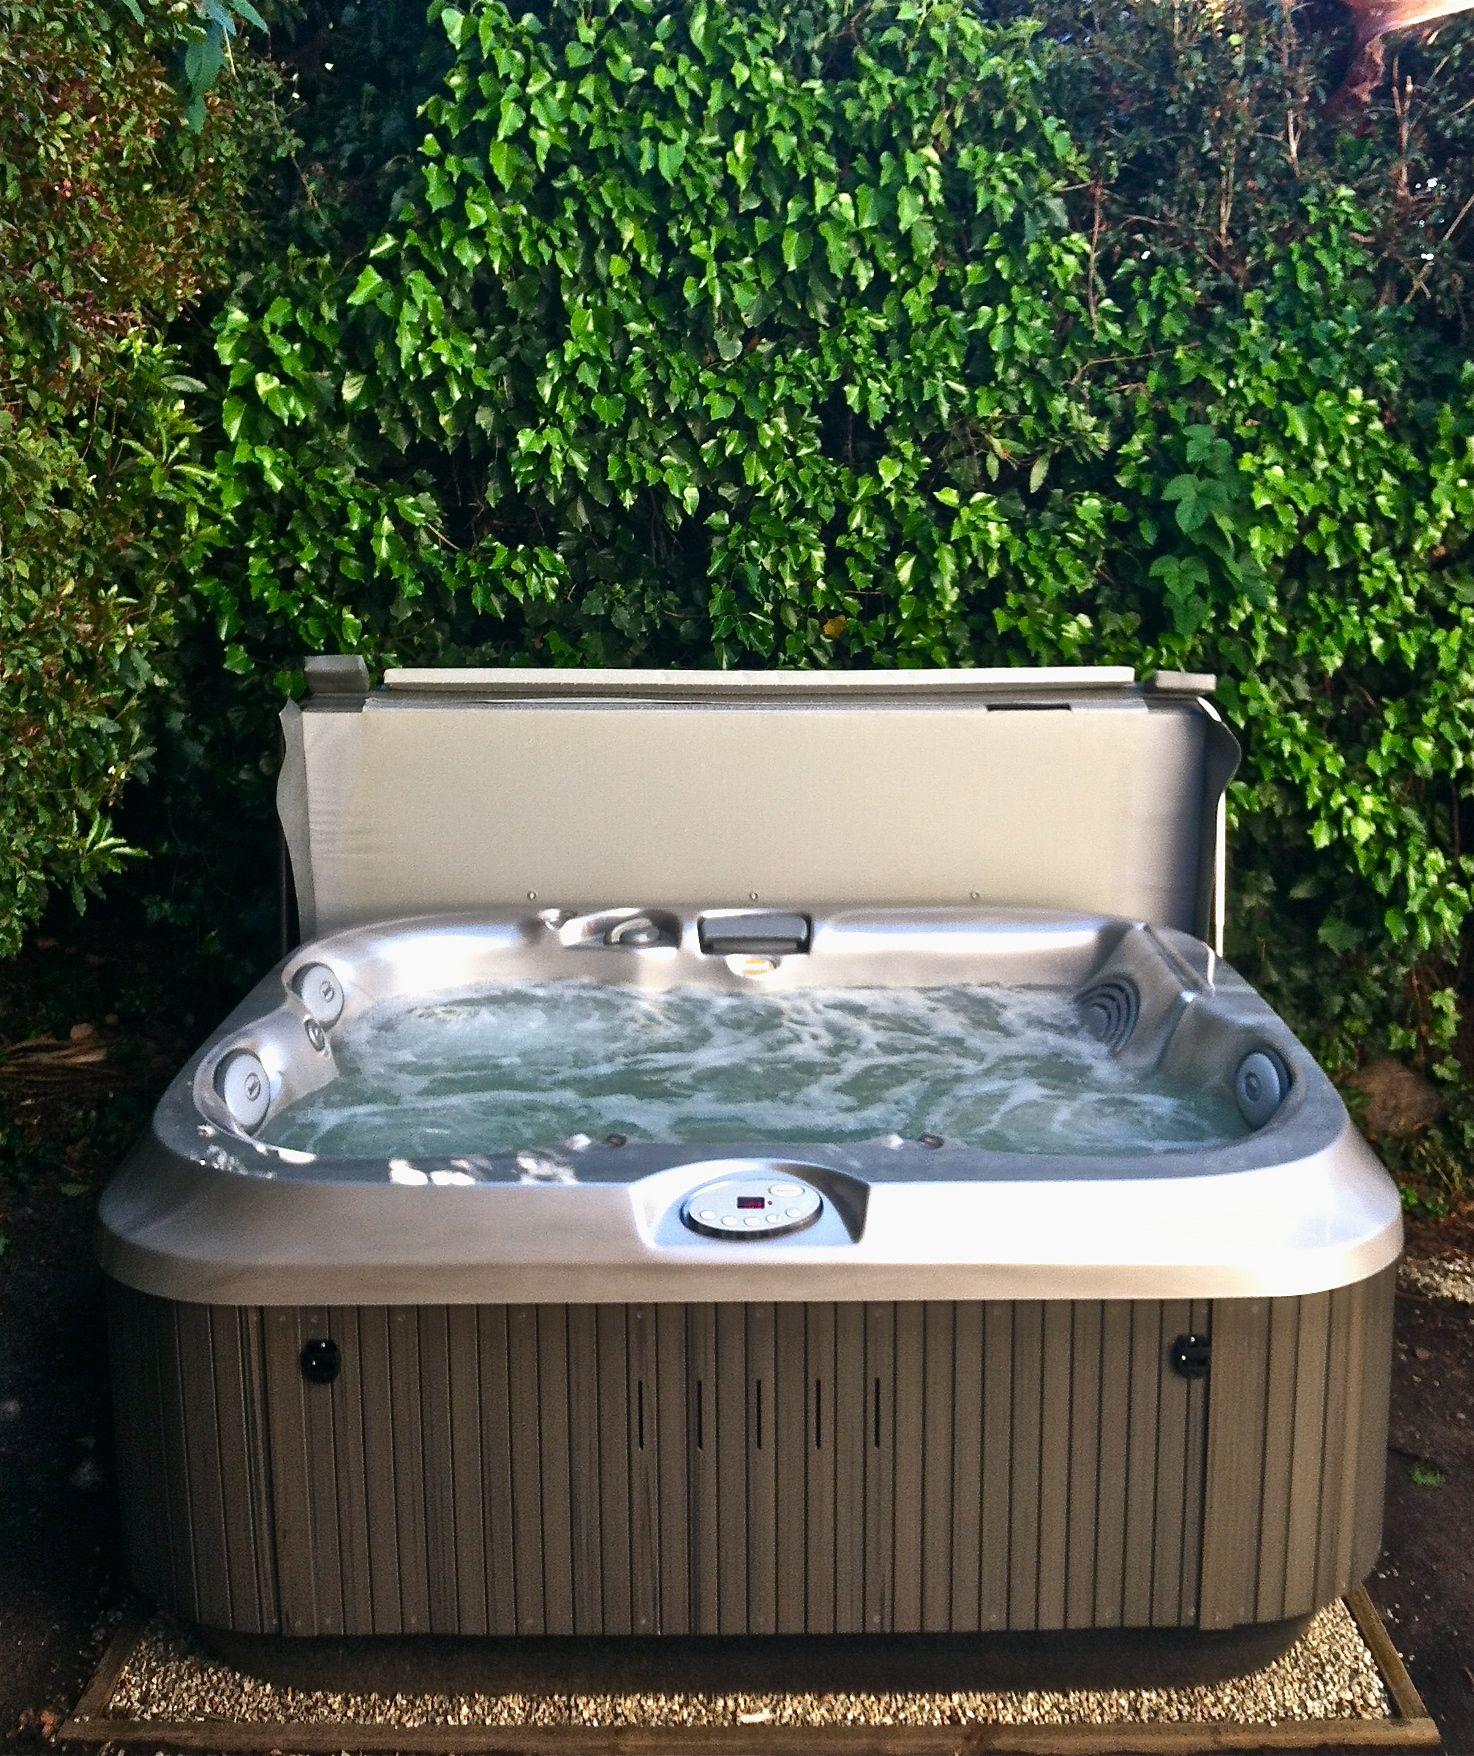 Jacuzzi J315 Model Www Gordonandgrant Com Jacuzzi Hot Tub Hot Tub Cover Jacuzzi